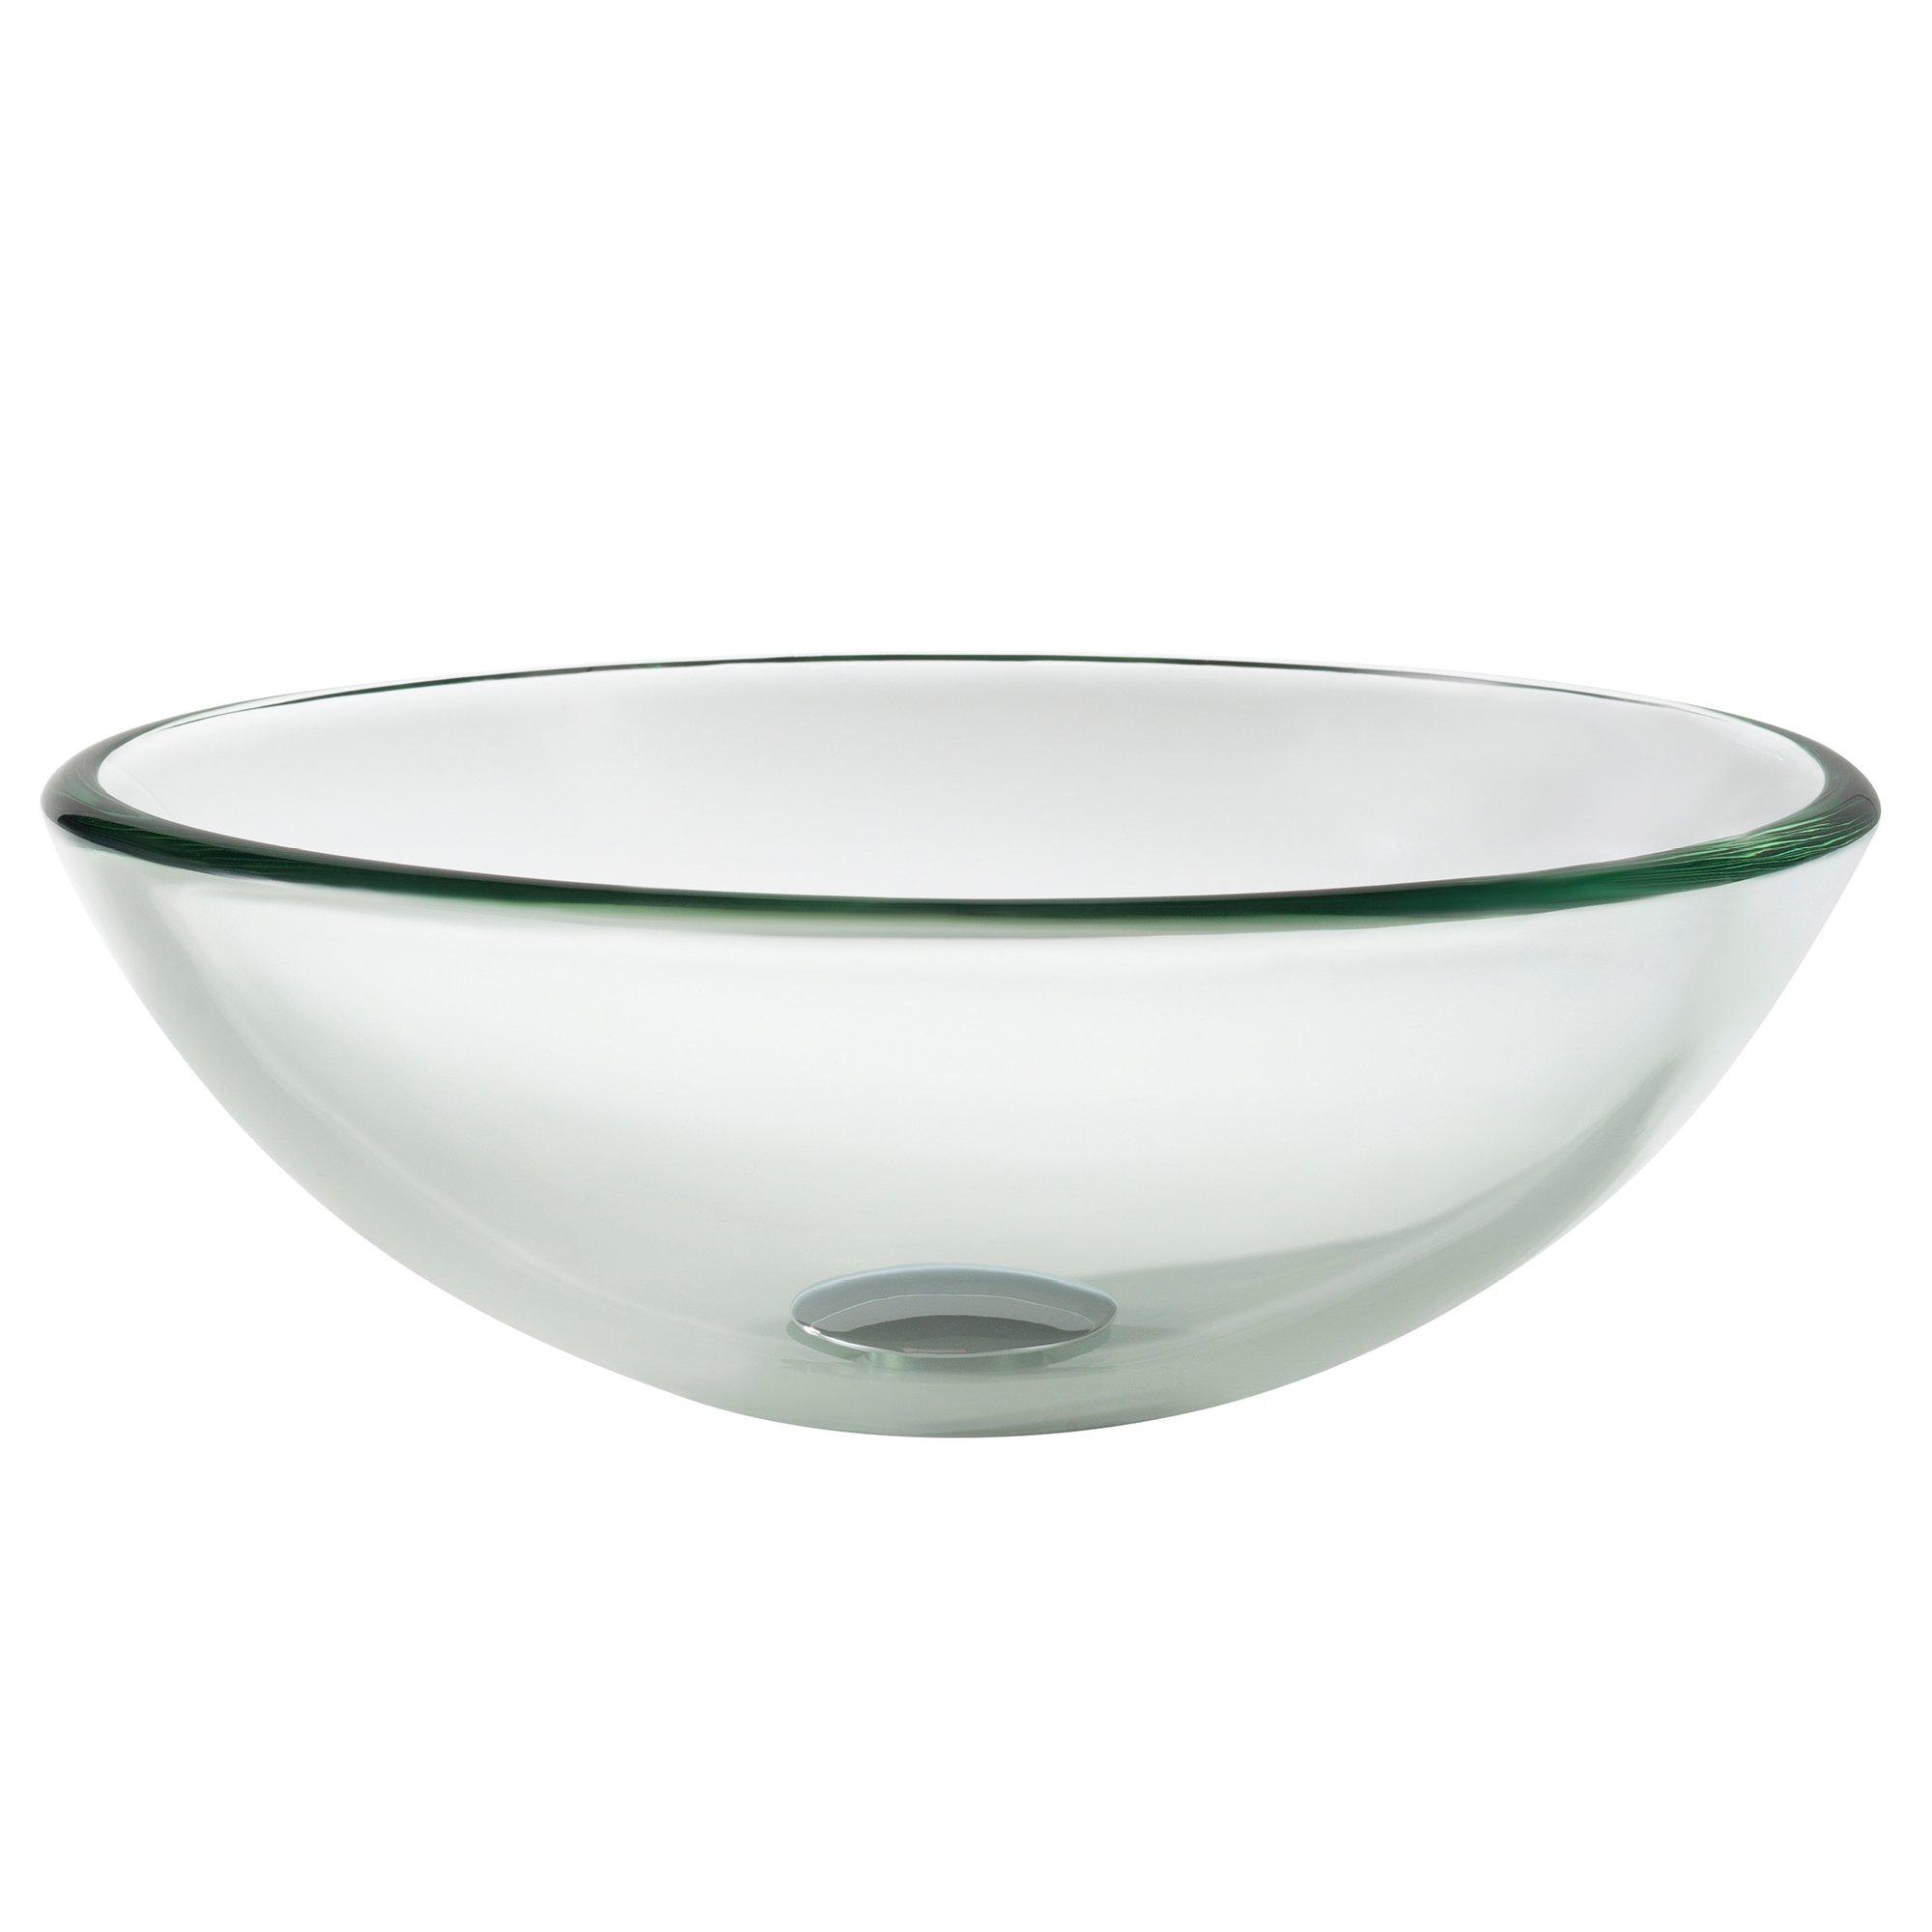 Kraus GV-101-14 Clear 14 inch Glass Vessel Bathroom Sink